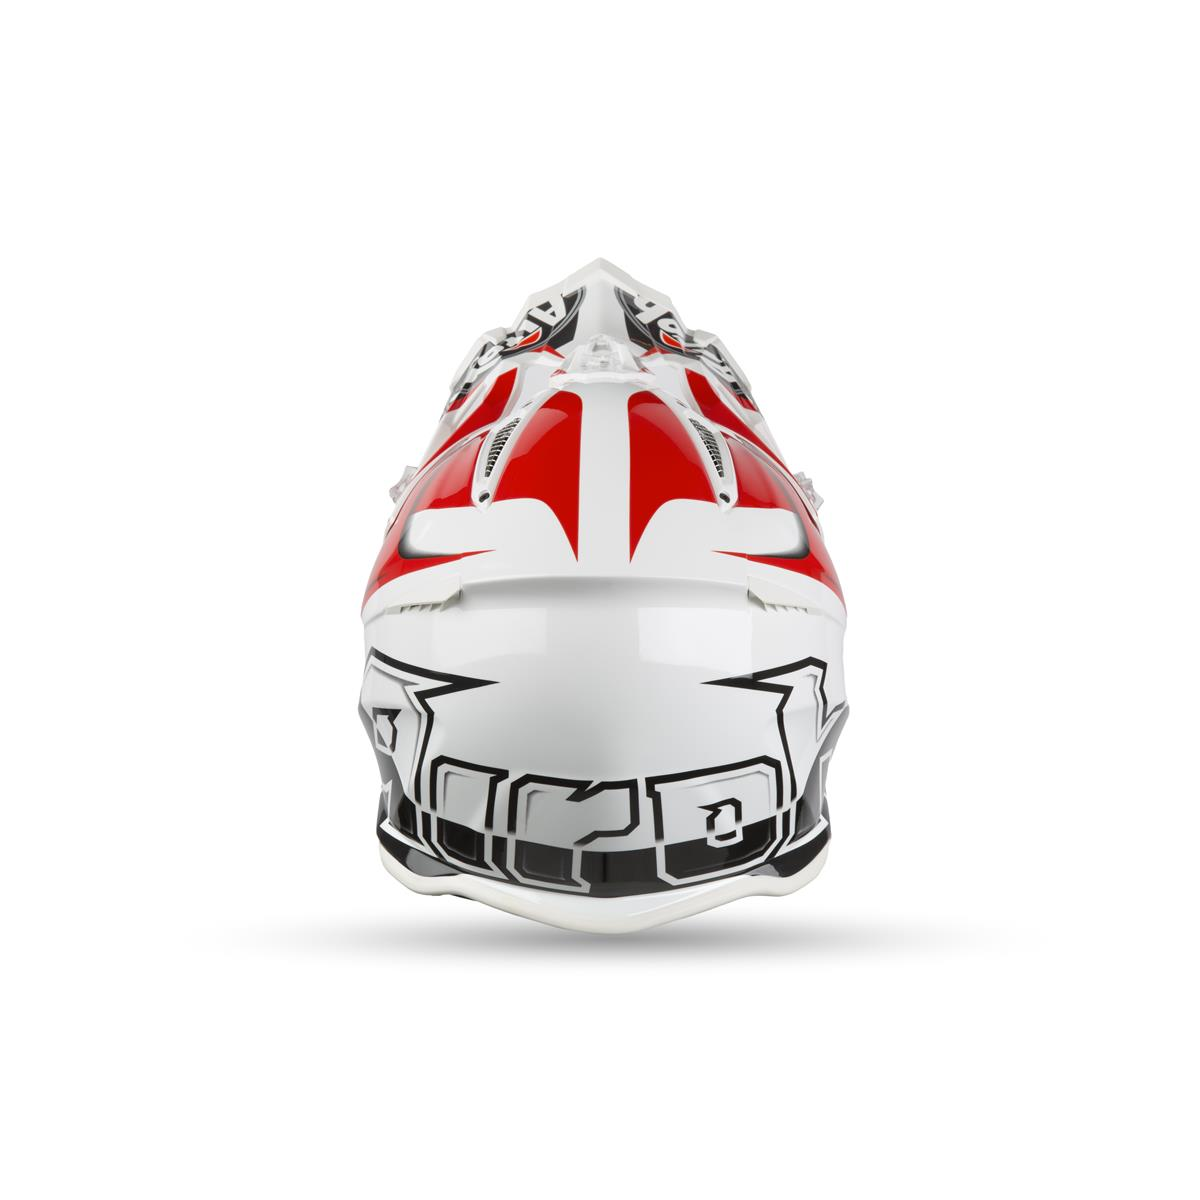 airoh-helm-mx-helmet-aviator-2-2-6